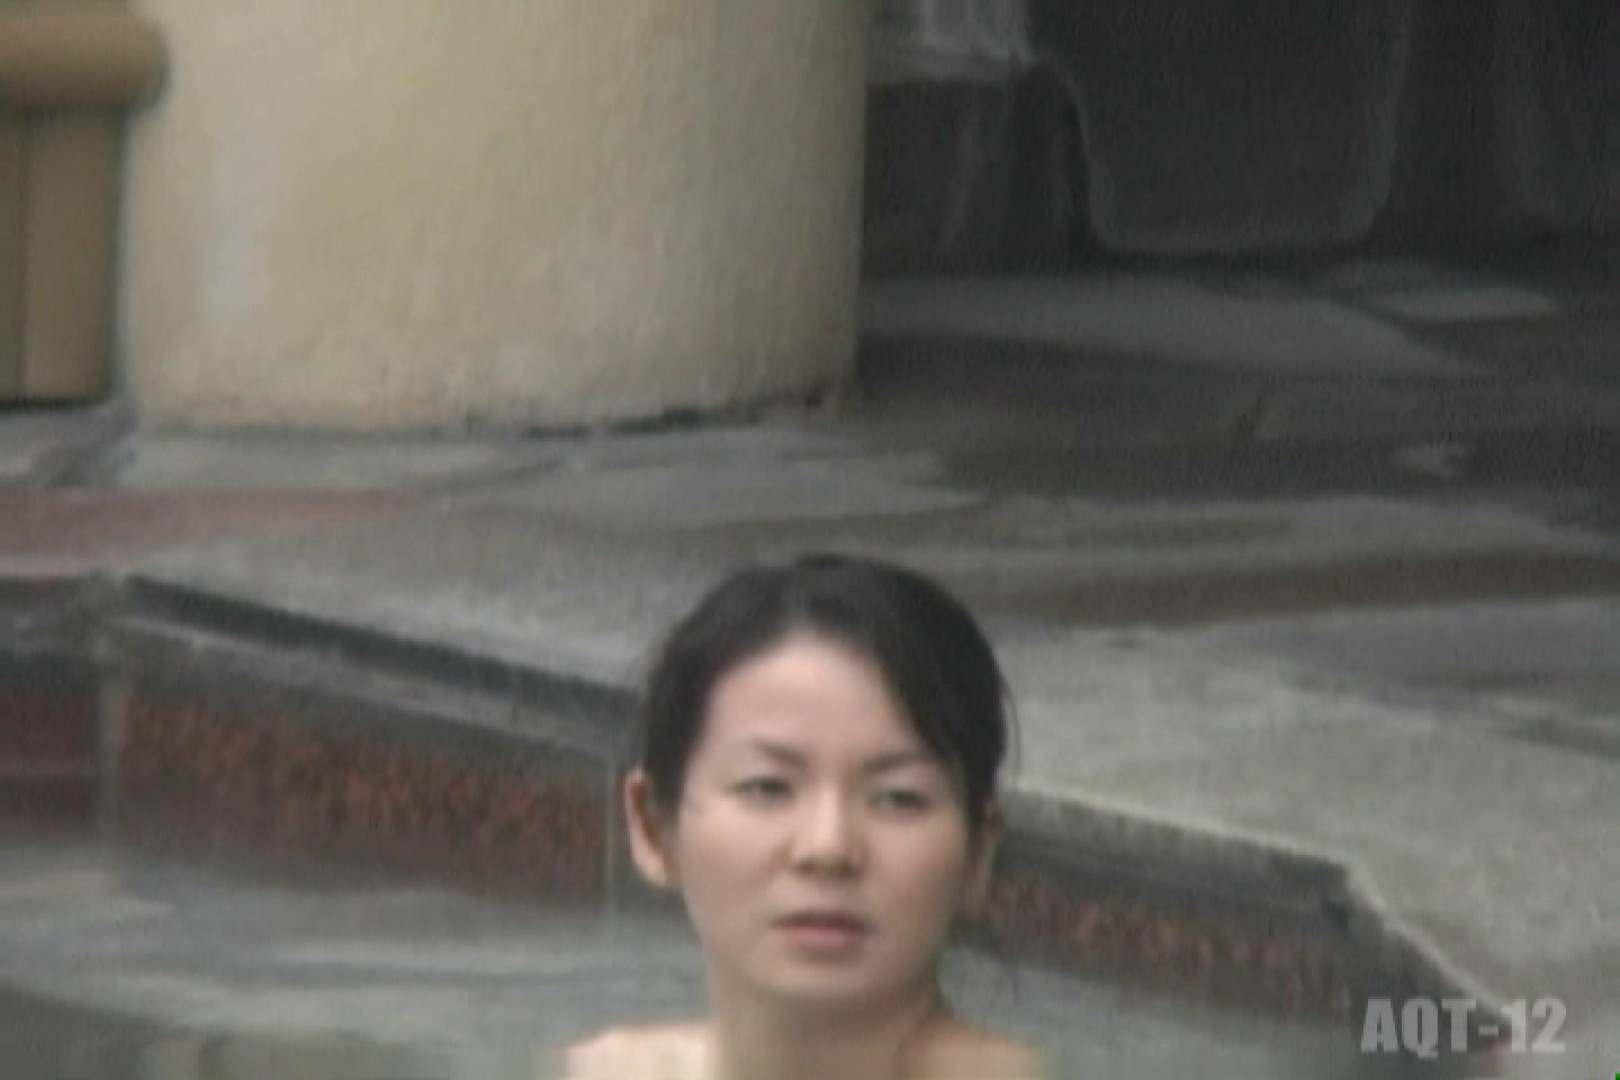 Aquaな露天風呂Vol.811 0  38連発 12